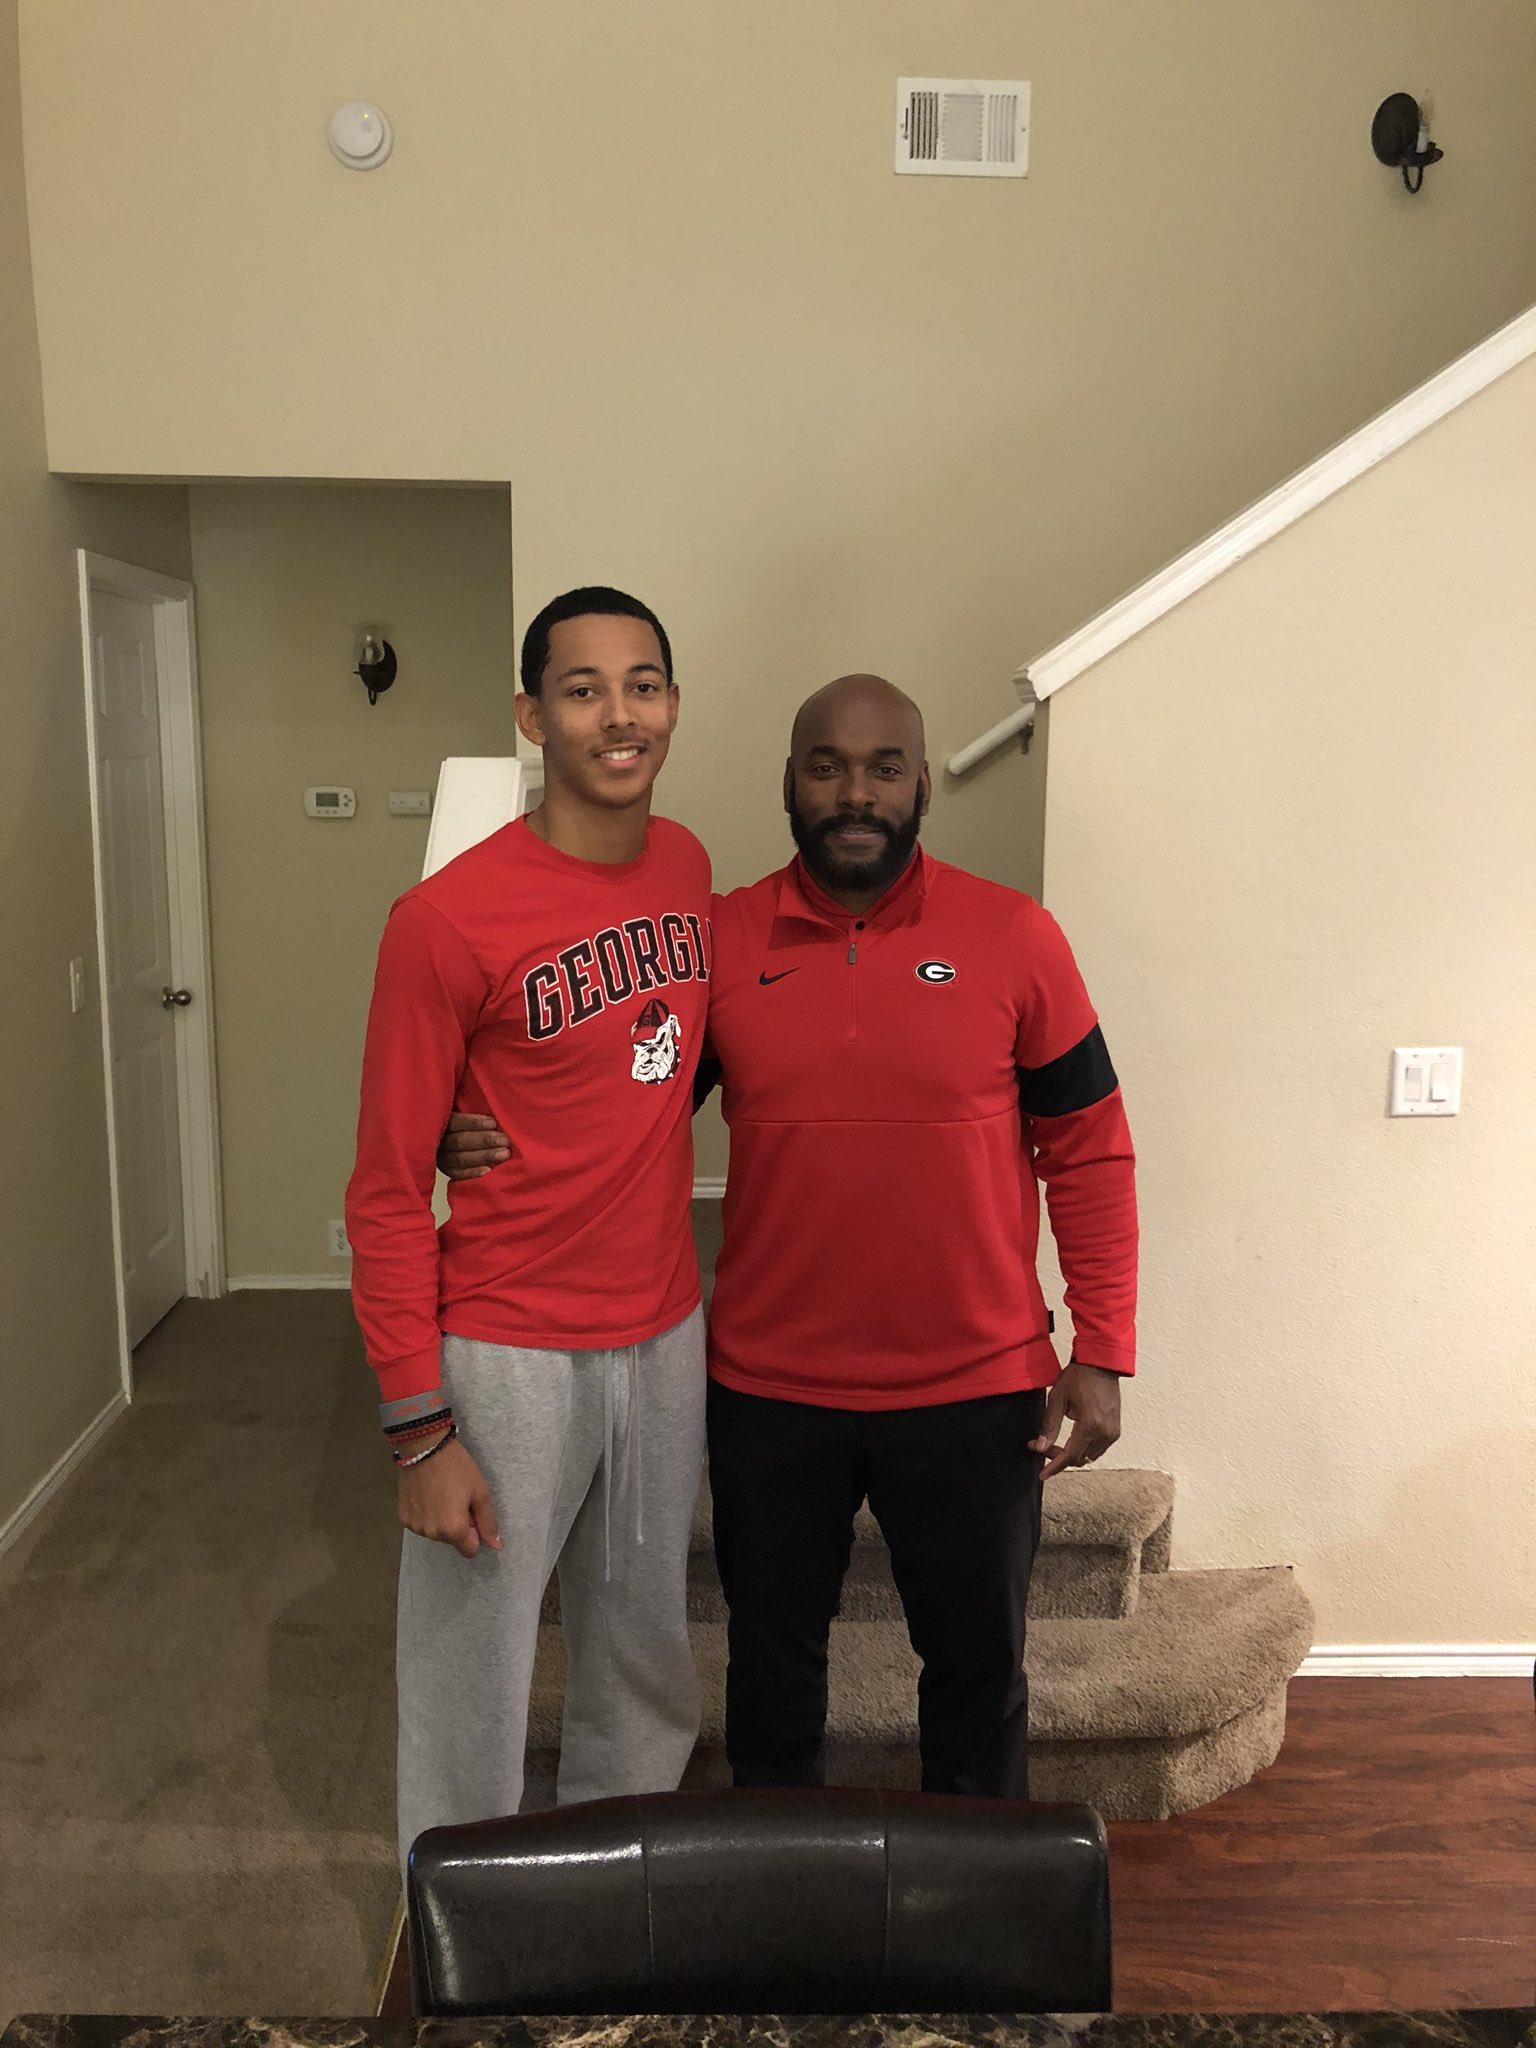 Photo: UGA assistant coach Charlton Warren visiting Jalen Kimber in-home in December of 2019, Jalen Kimber Twitter